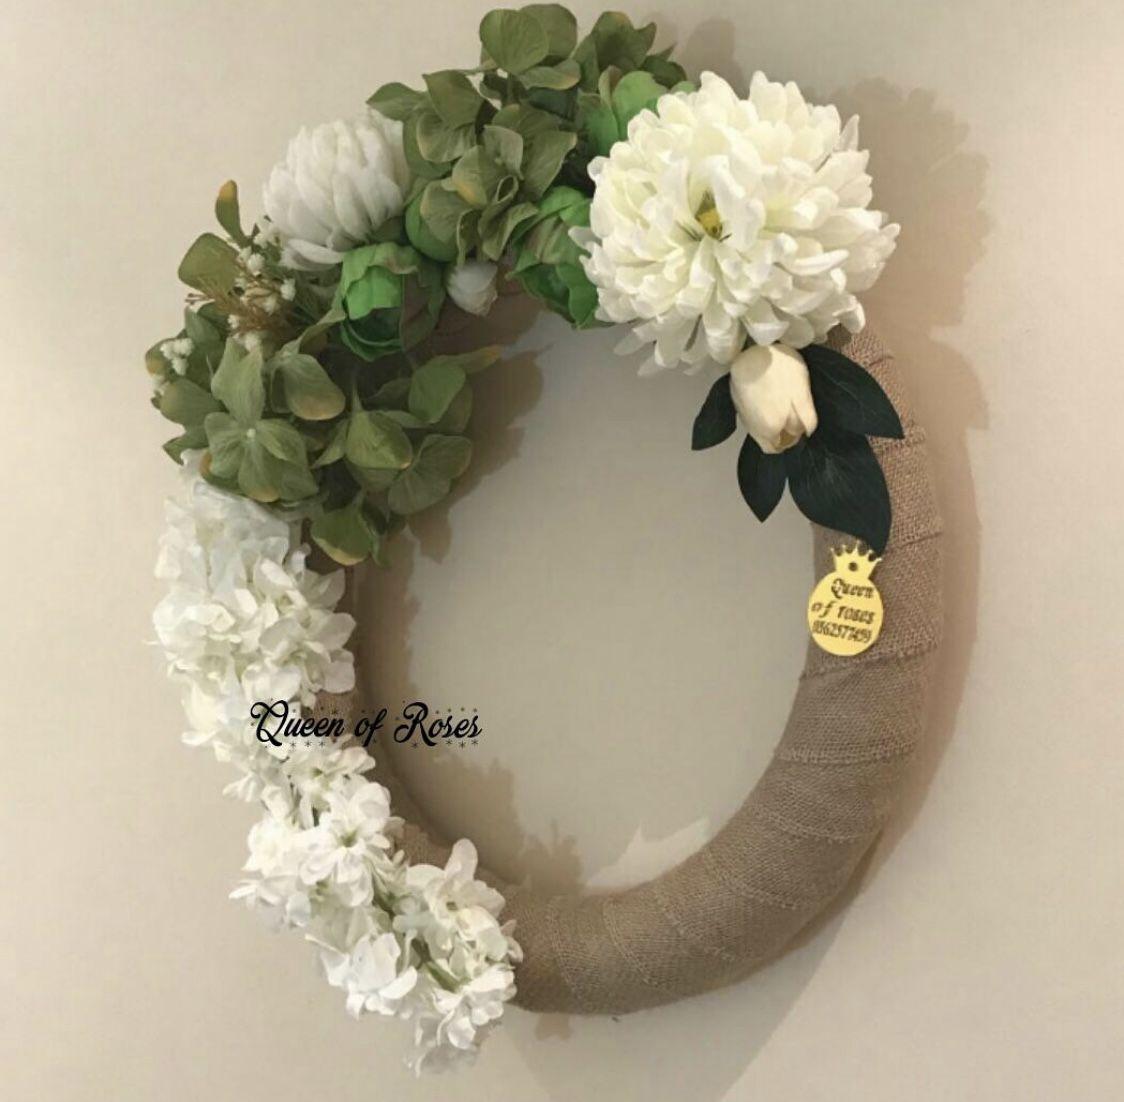 تعليقة ورد Floral Wreath Floral Wreaths